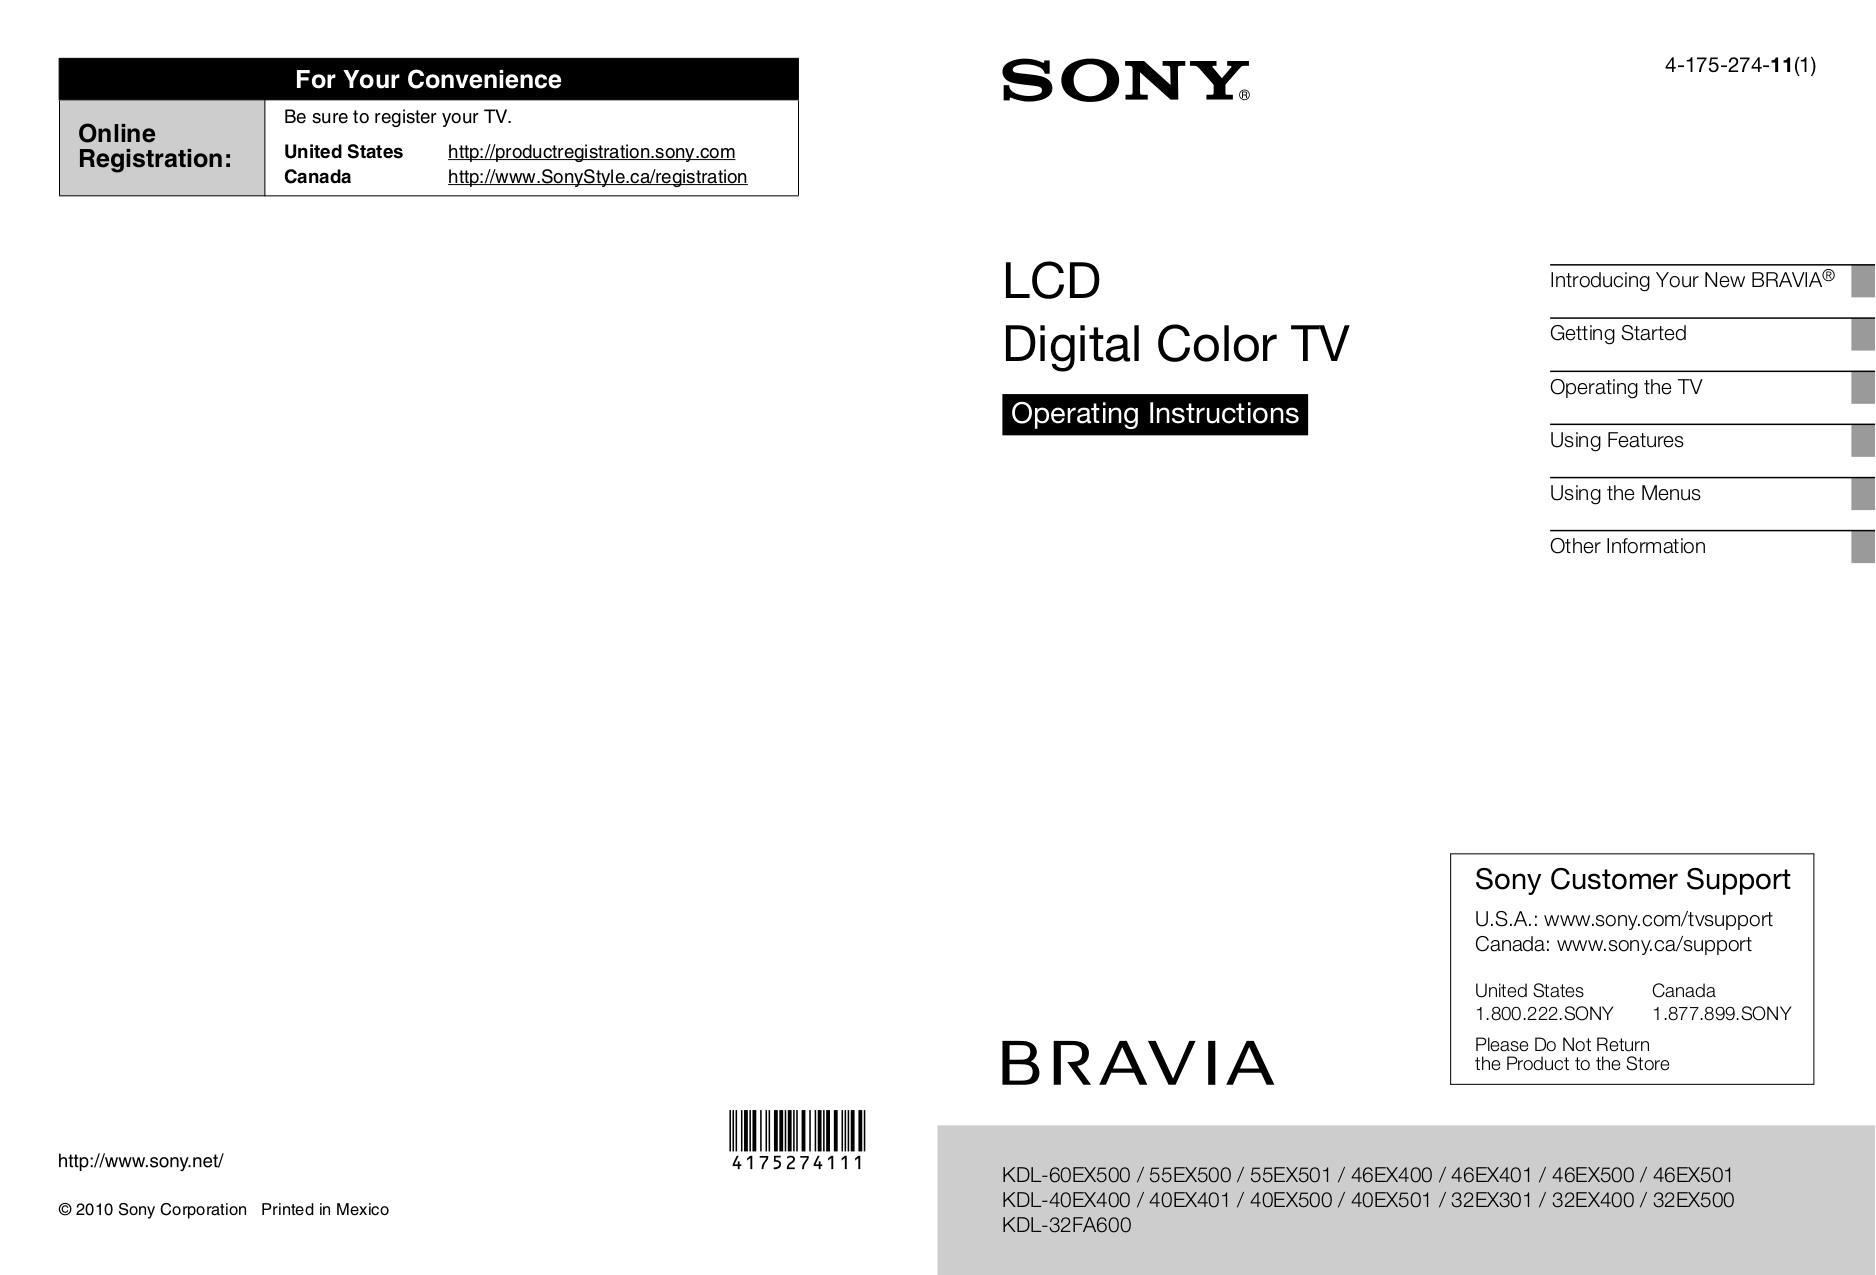 download free pdf for sony bravia kdl 32ex400 tv manual rh umlib com sony bravia kdl-32ex400 manual sony bravia kdl-32bx400 manual